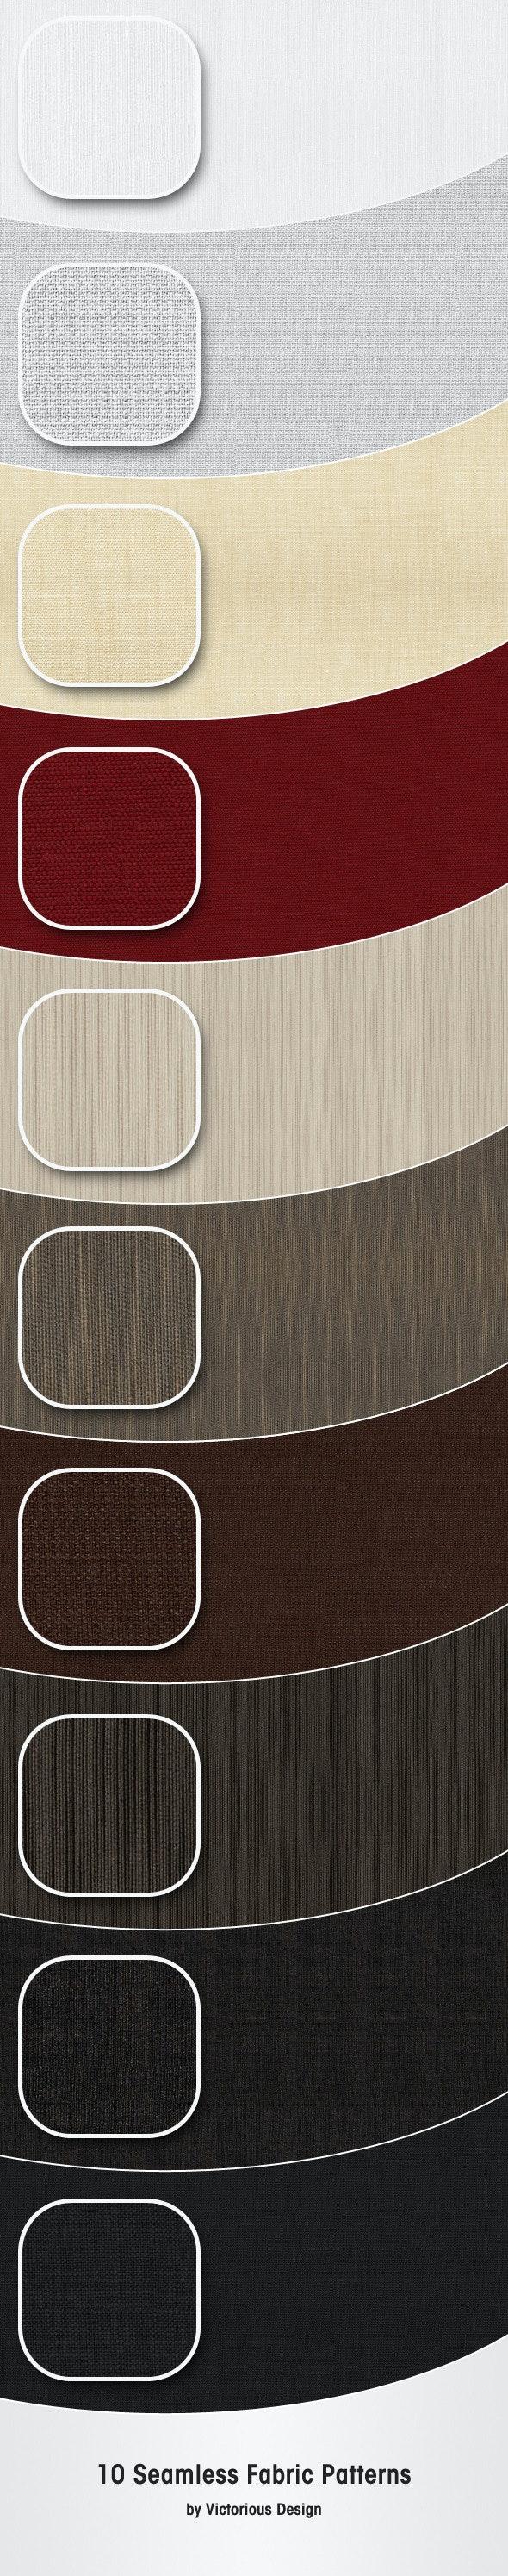 10 Seamless Fabric Patterns - Textures / Fills / Patterns Photoshop